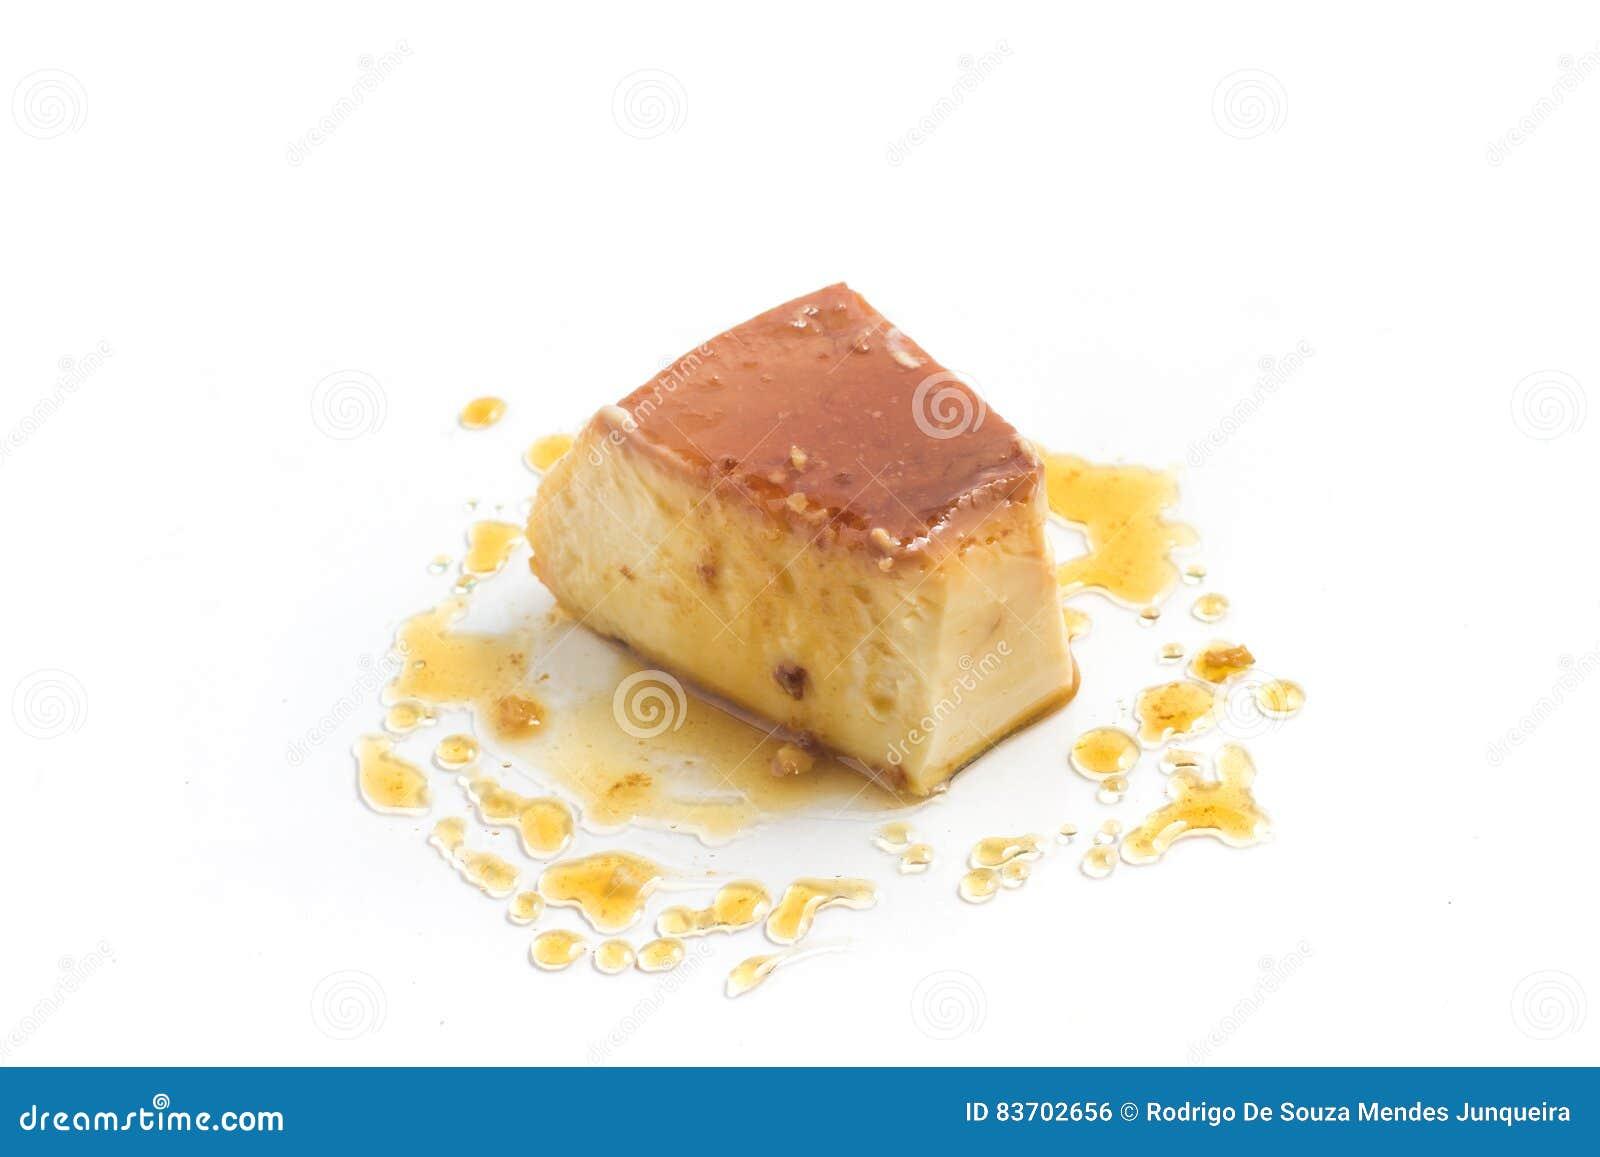 Milk Pudding. Brazilian Flan Stock Photo